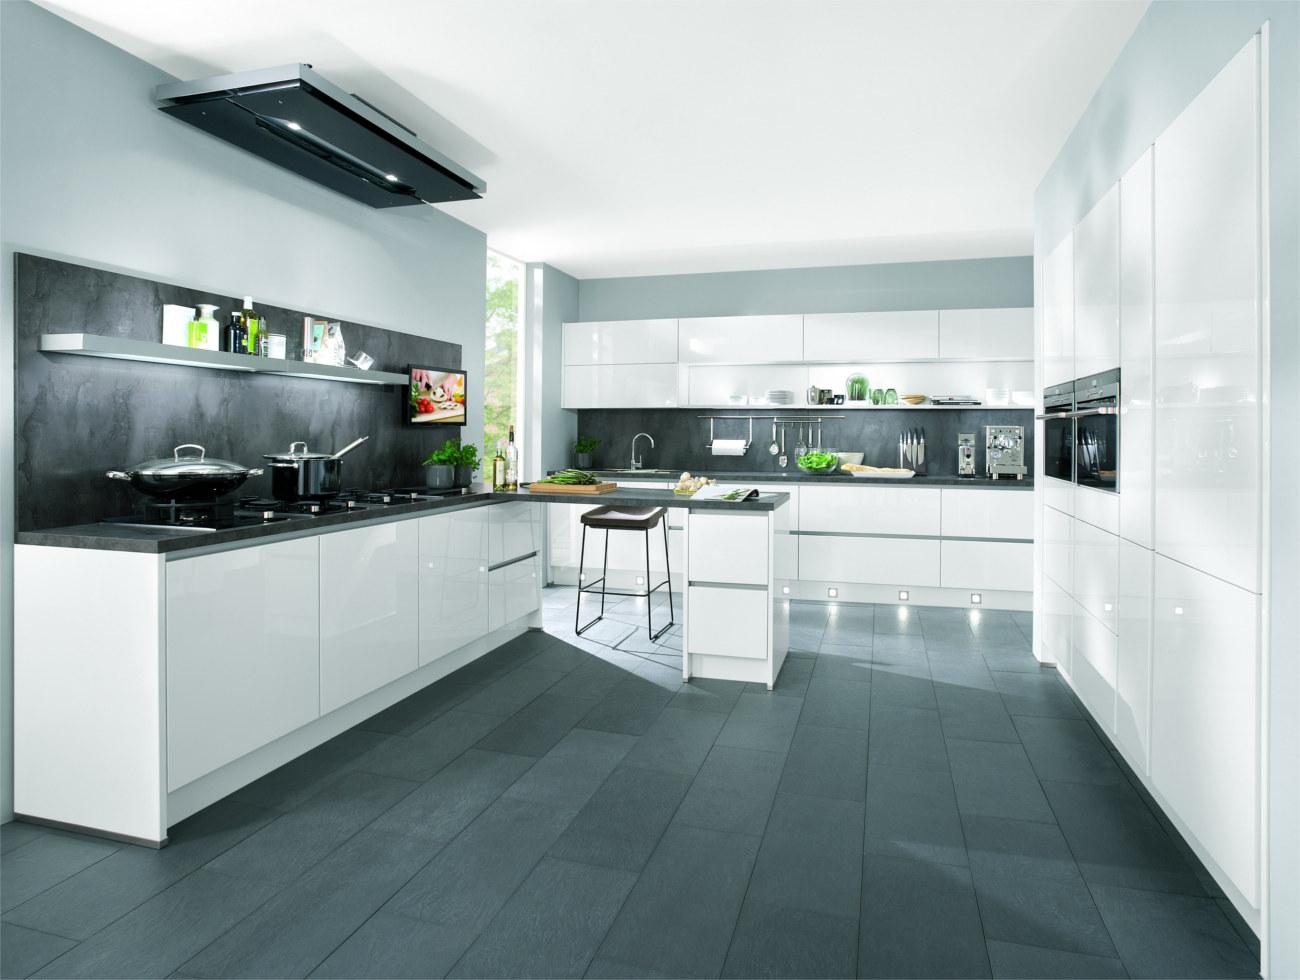 Cucina bianca moderna lucida piastrelle cucina bianca prezzi